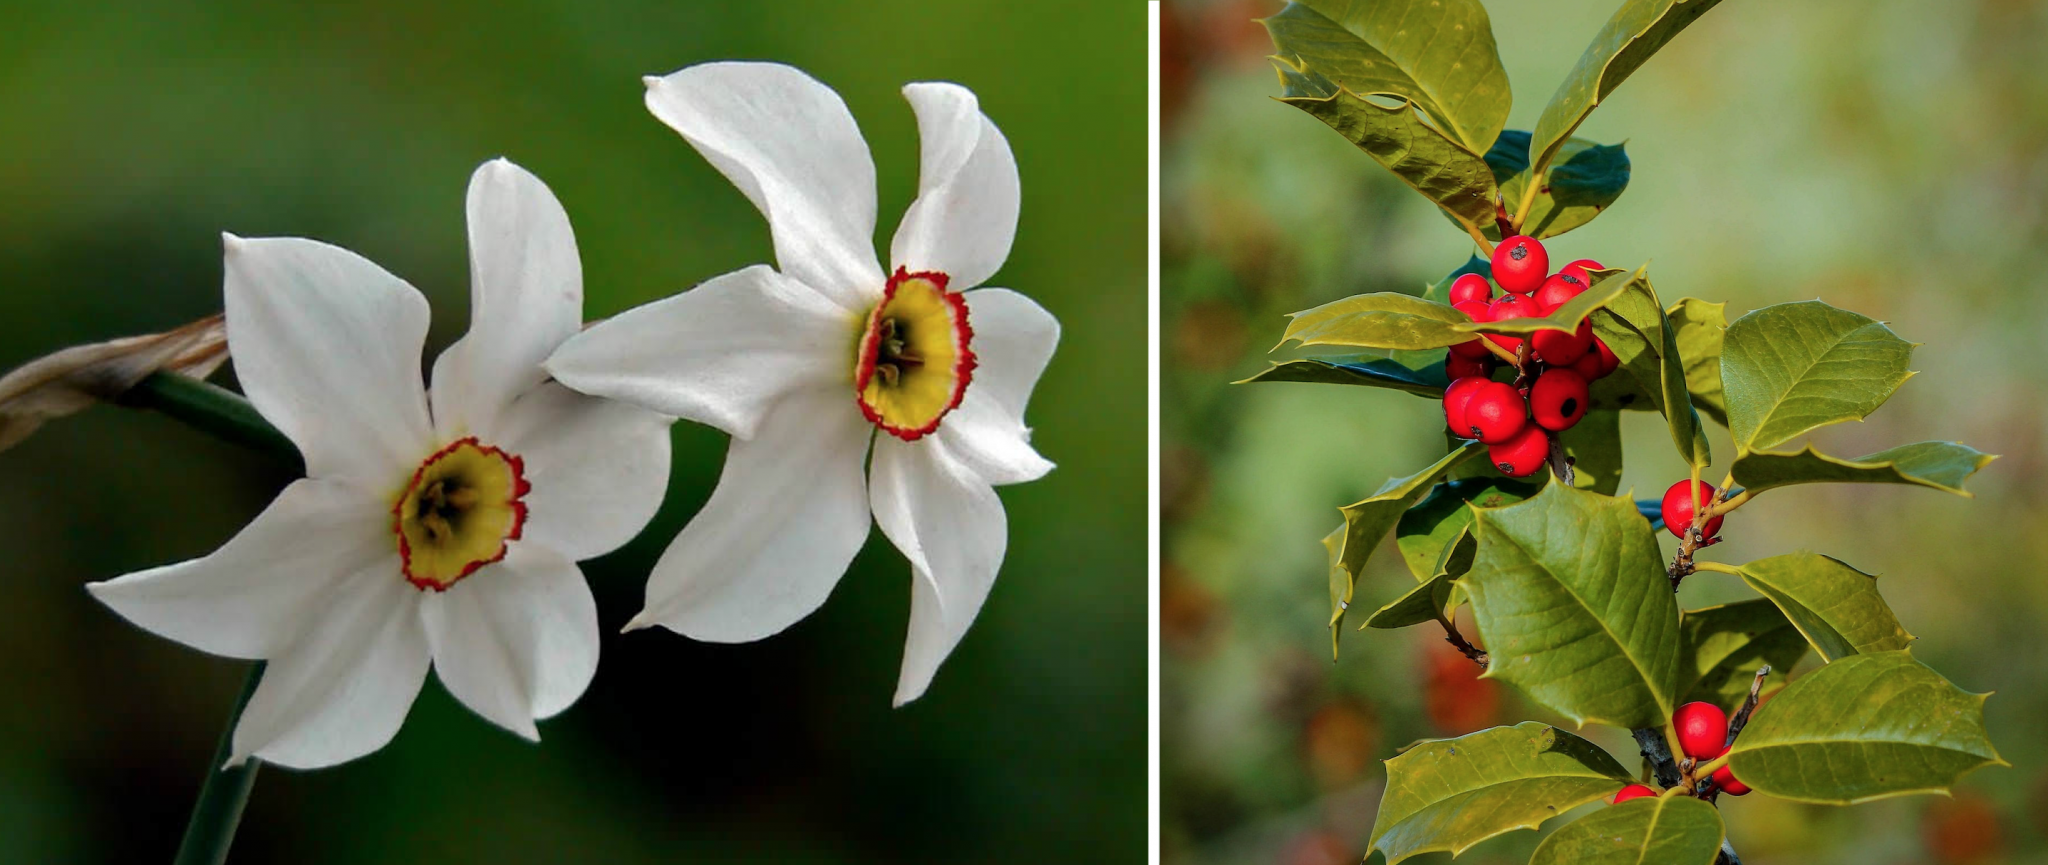 Growth In Gardening December Birth Flower San Marcos Record